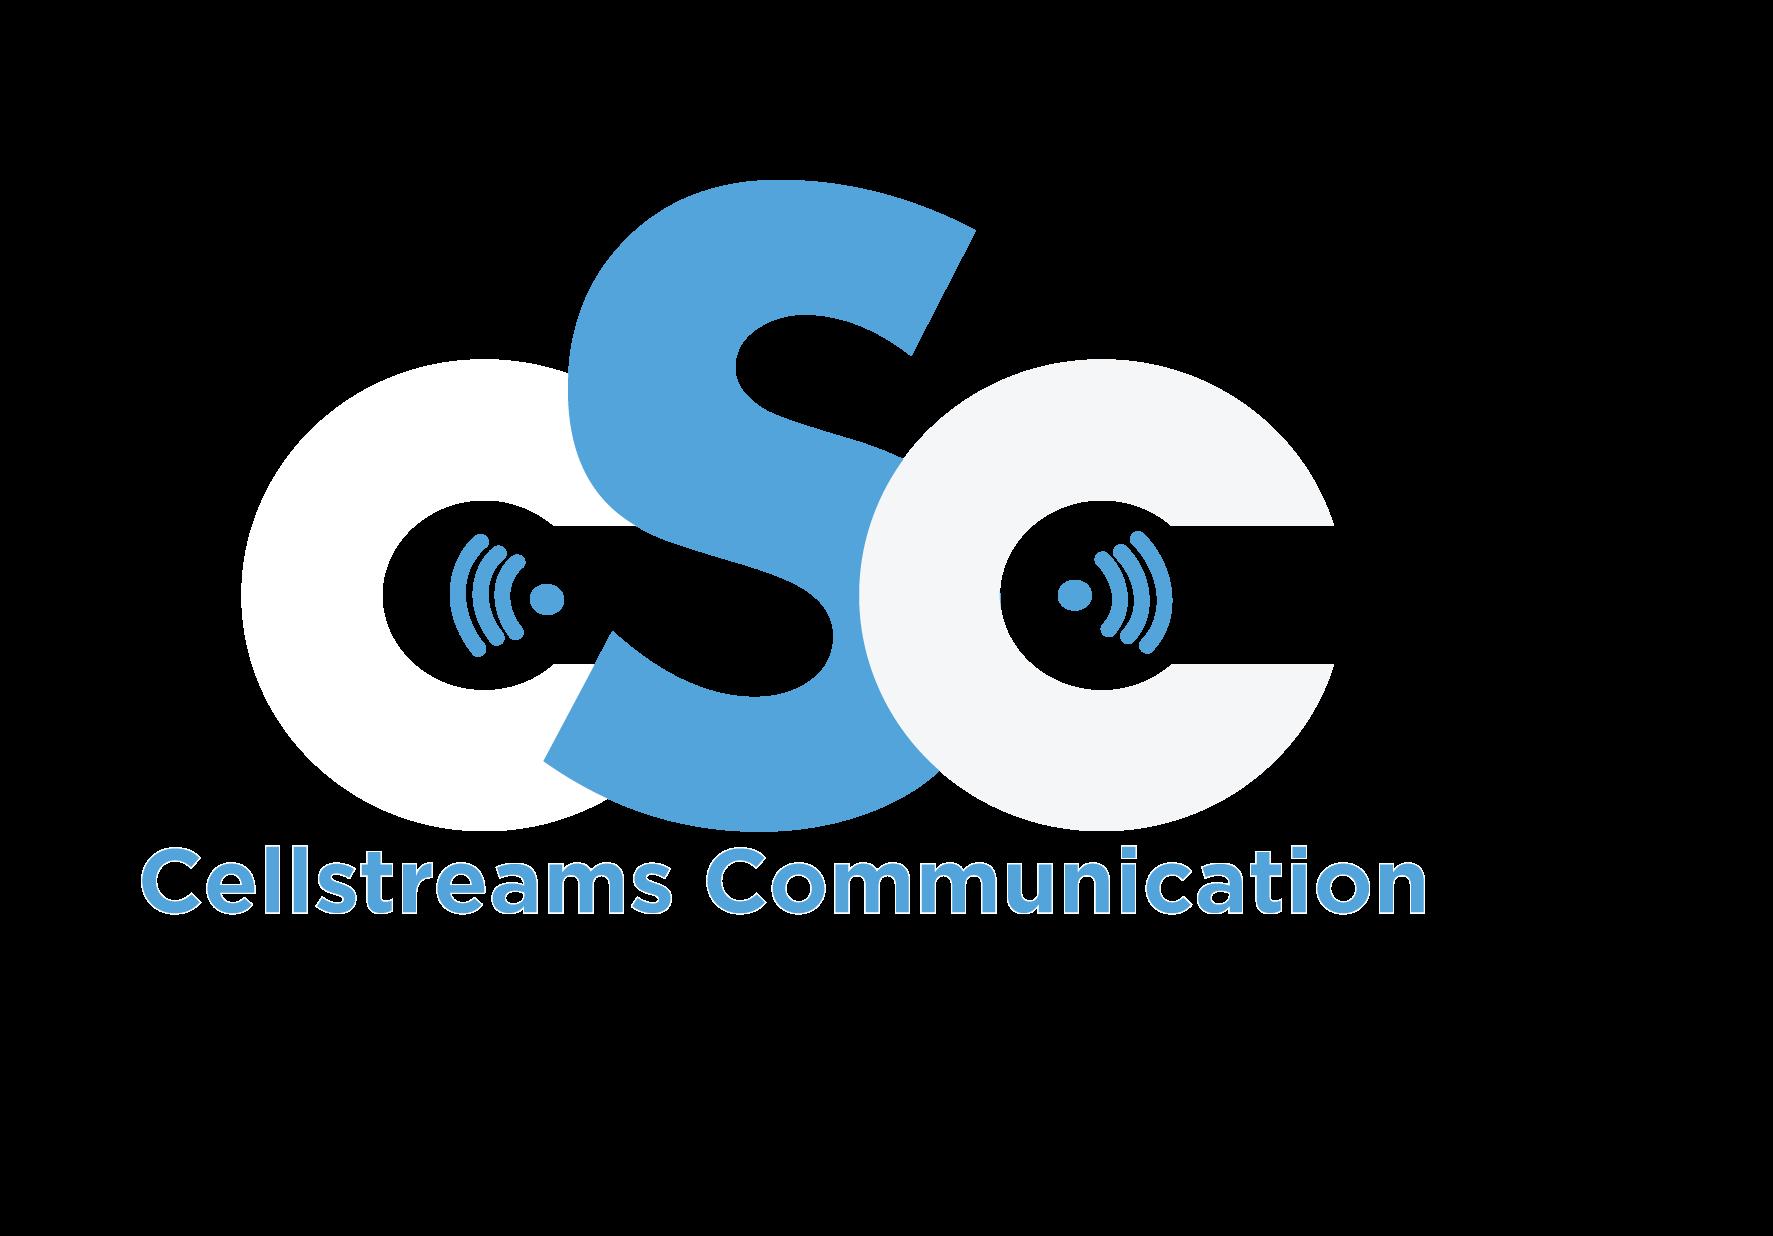 Cellstreams Communication